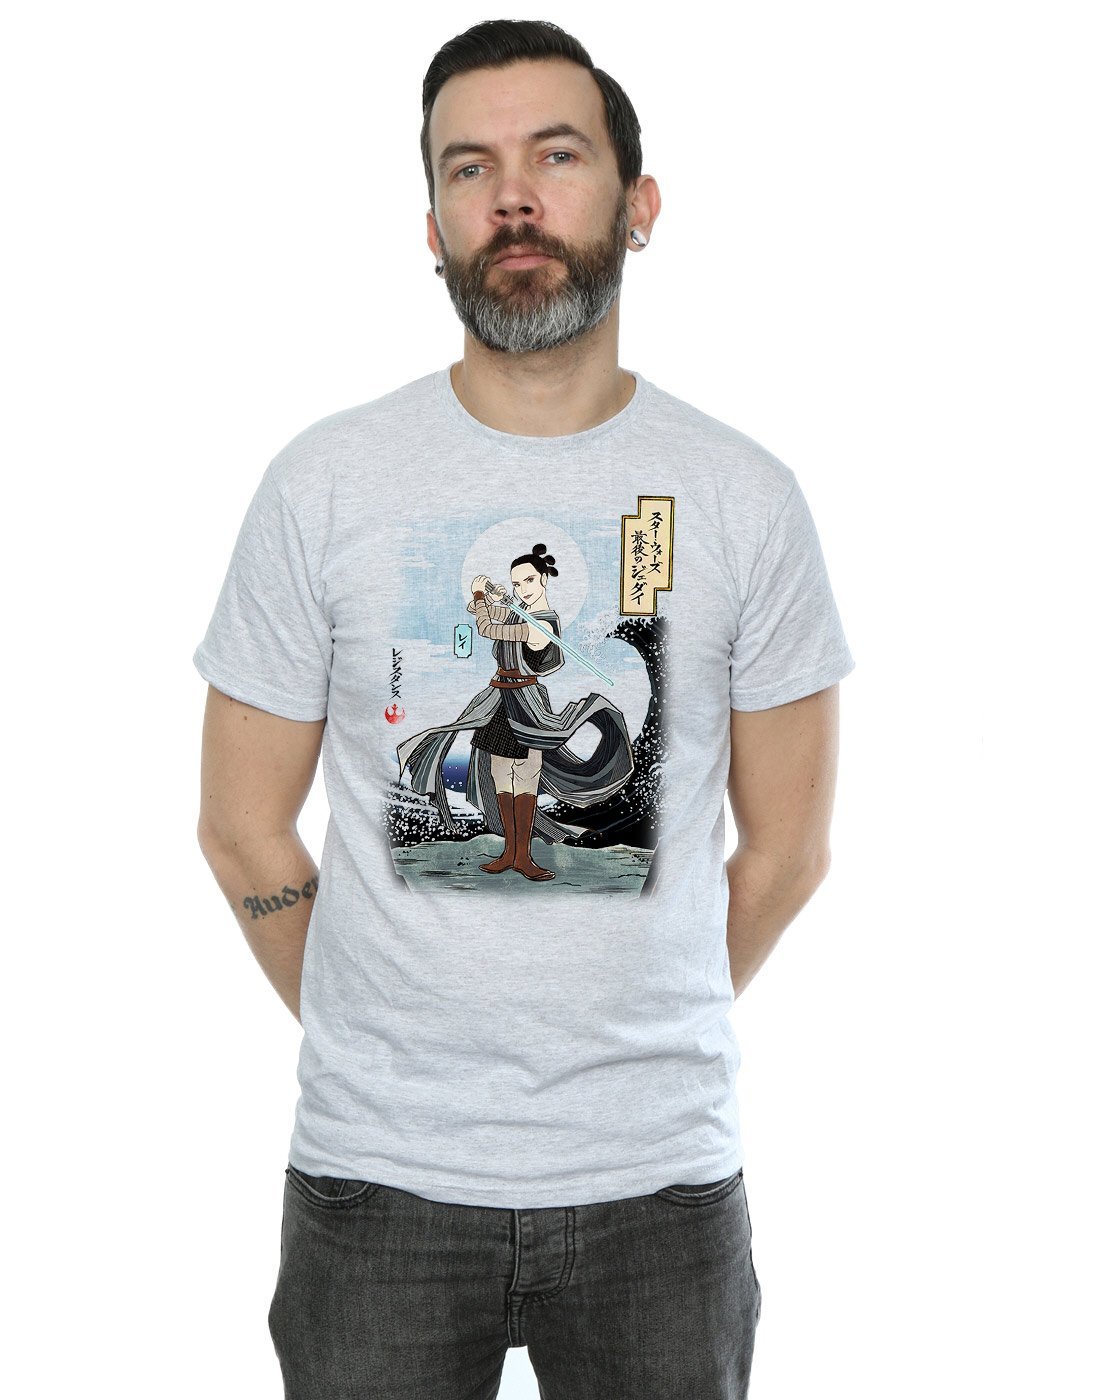 Star Wars S The Last Jedi Japanese Rey Tshirt